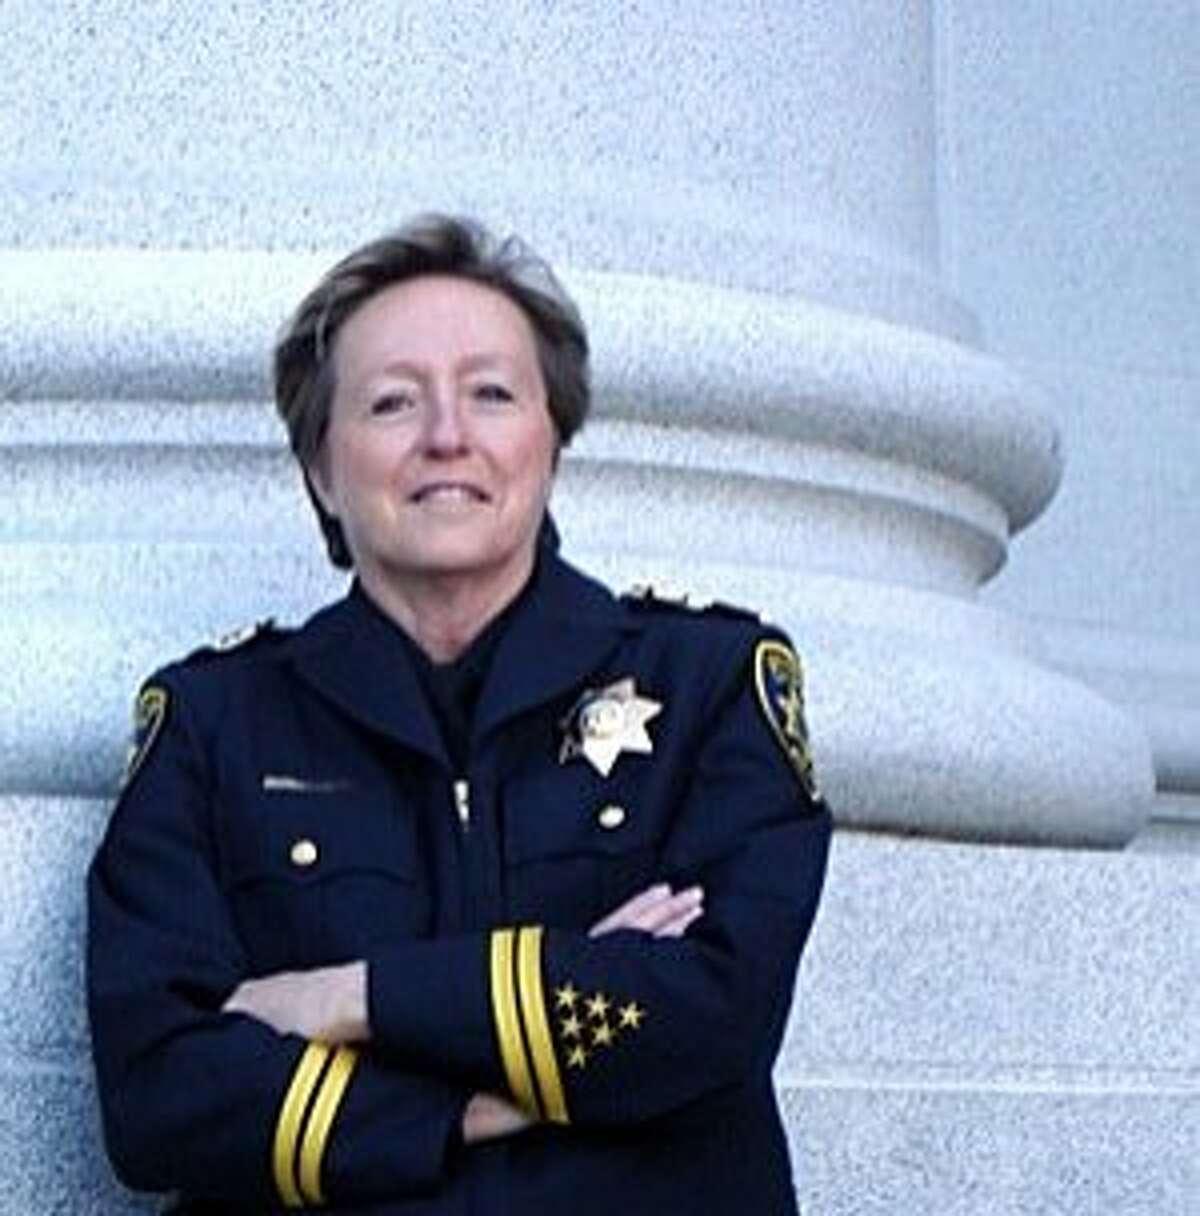 UC Berkeley Police Chief Margo Bennett had her gun, badge, ammunition and other items stolen during a car burglary at Point Isabel Regional Shoreline in Richmond.